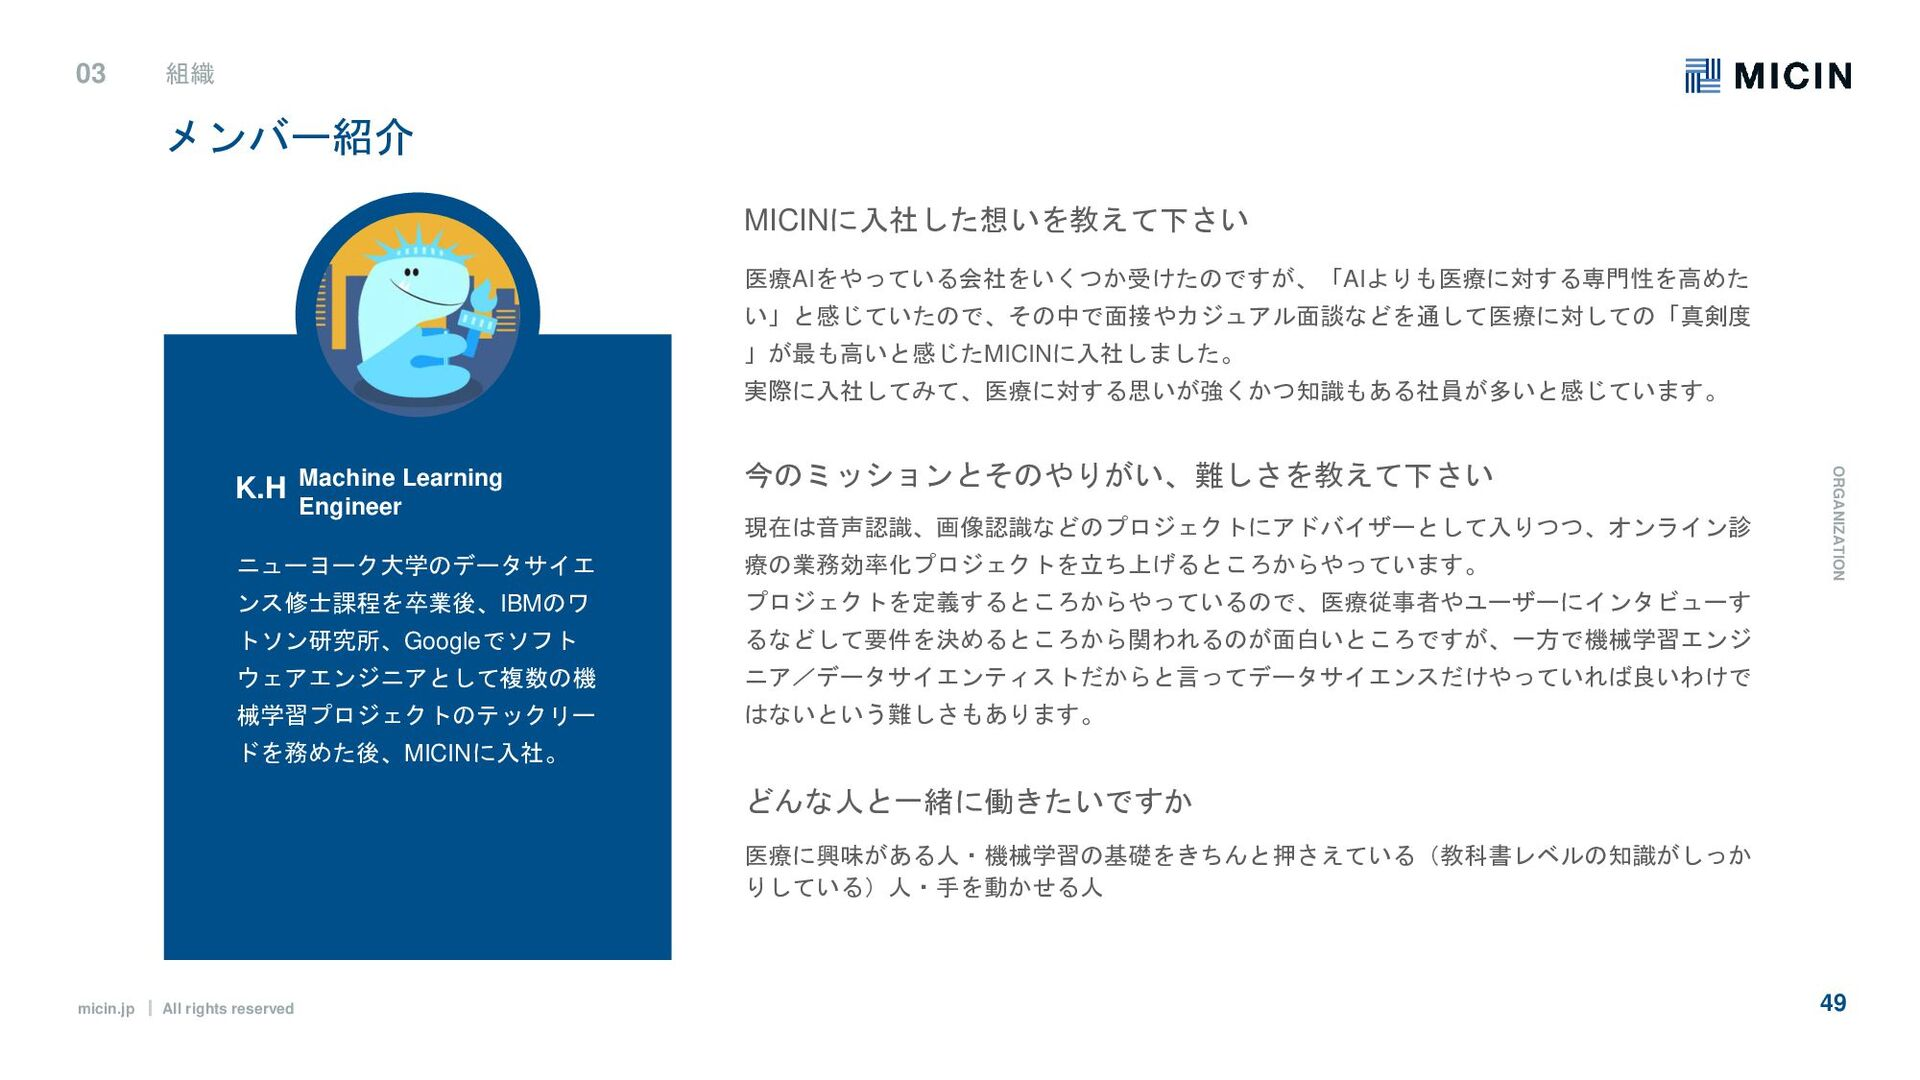 micin.jp ʛ All rights reserved 49 メンバー紹介 03 H.O...